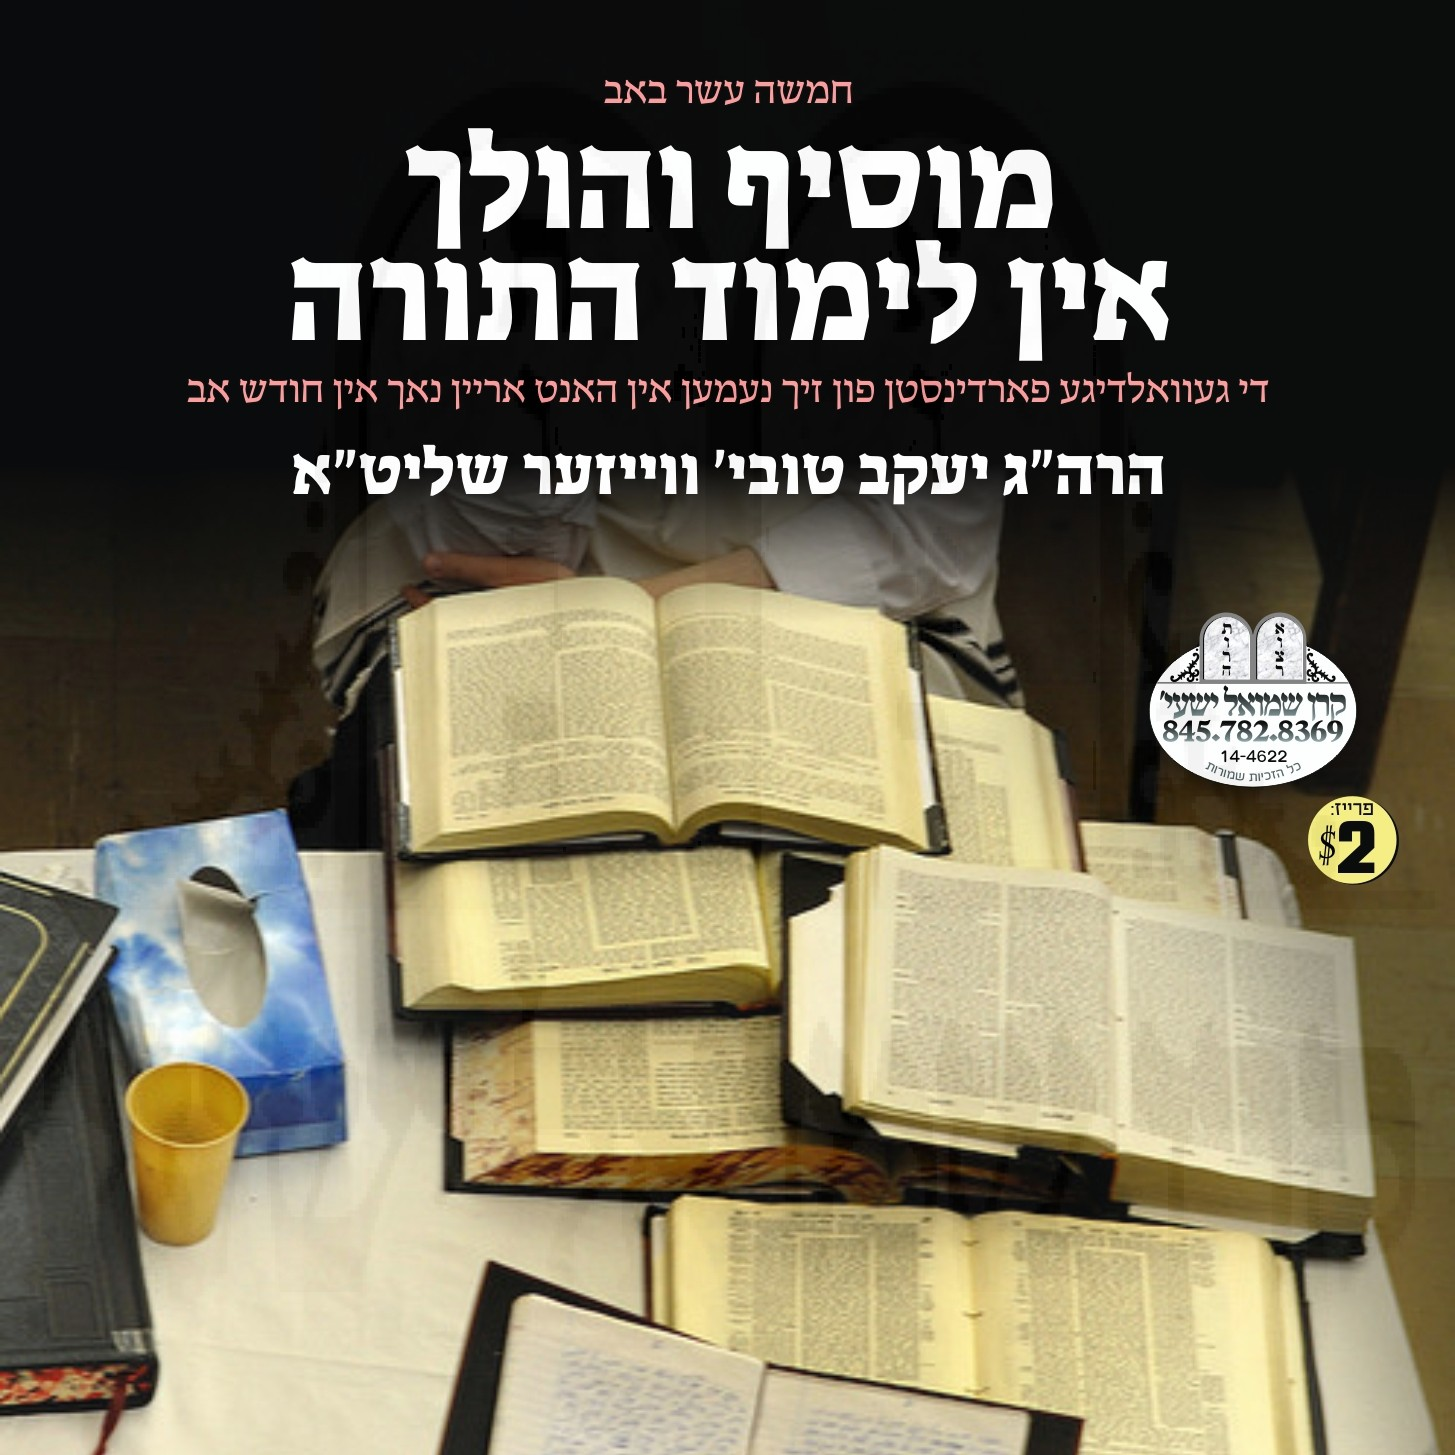 MOISIF VEHOILEICH IN LIMUD HATORAH